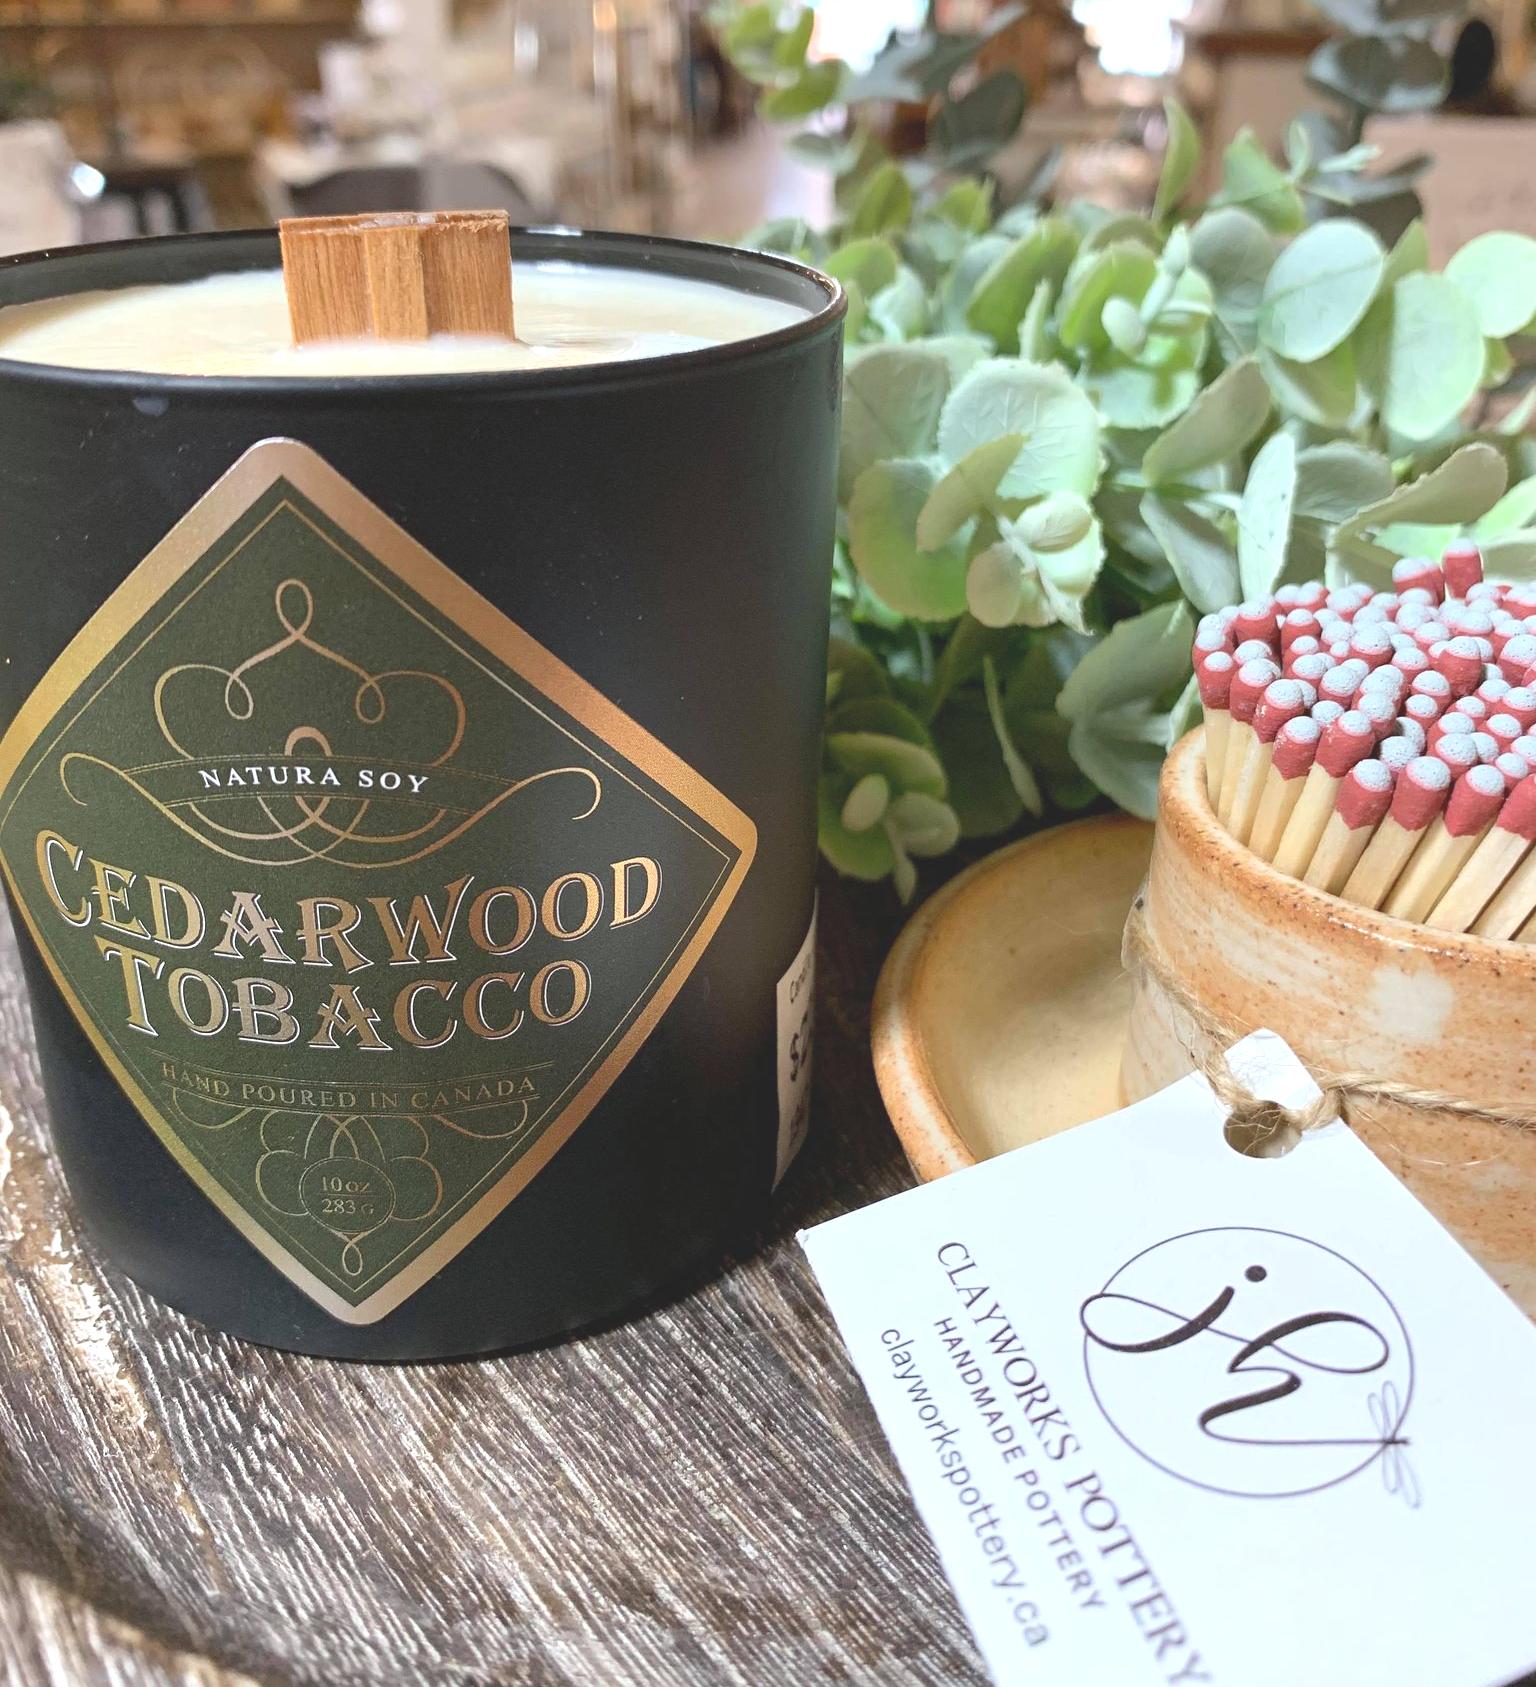 Cedarwood Tobacco Cedarwood, Tobacco, Patchouli and Amber.